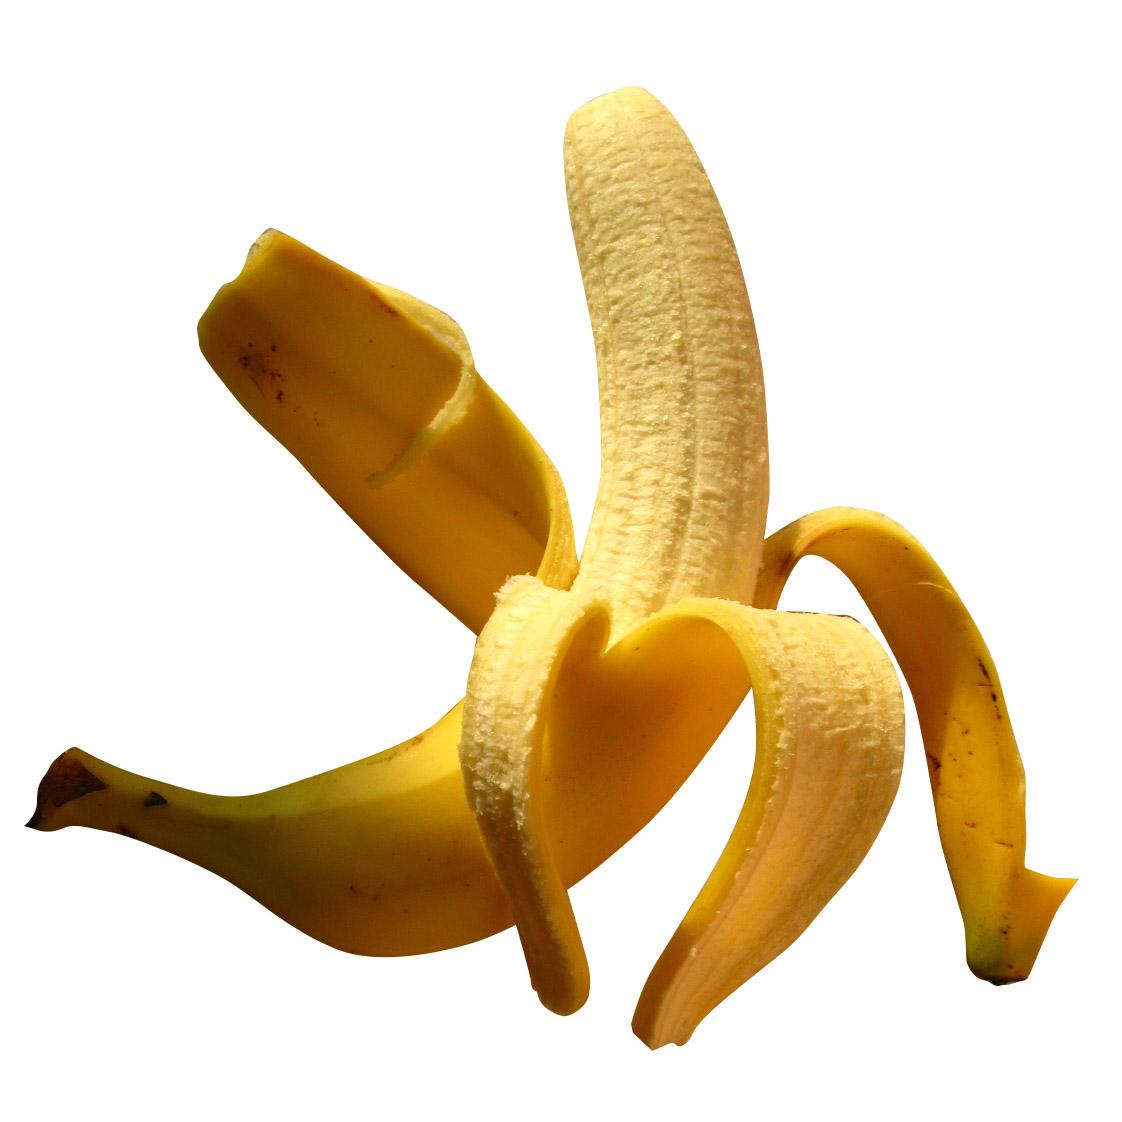 banana tumblr